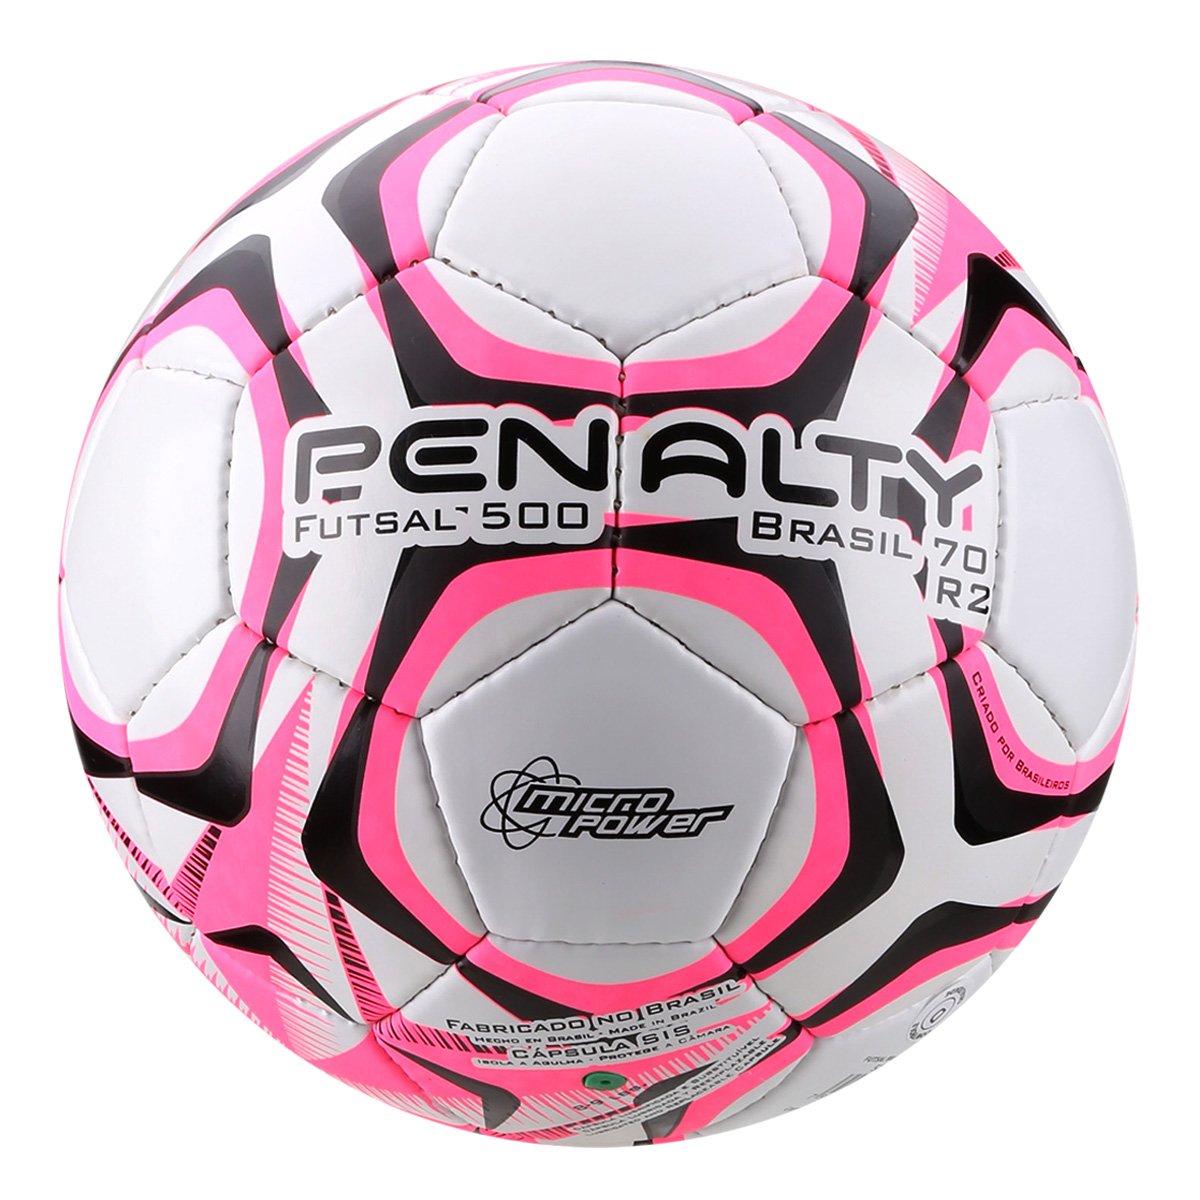 Bola Futsal Penalty Brasil 70 R2 Costurada a mão